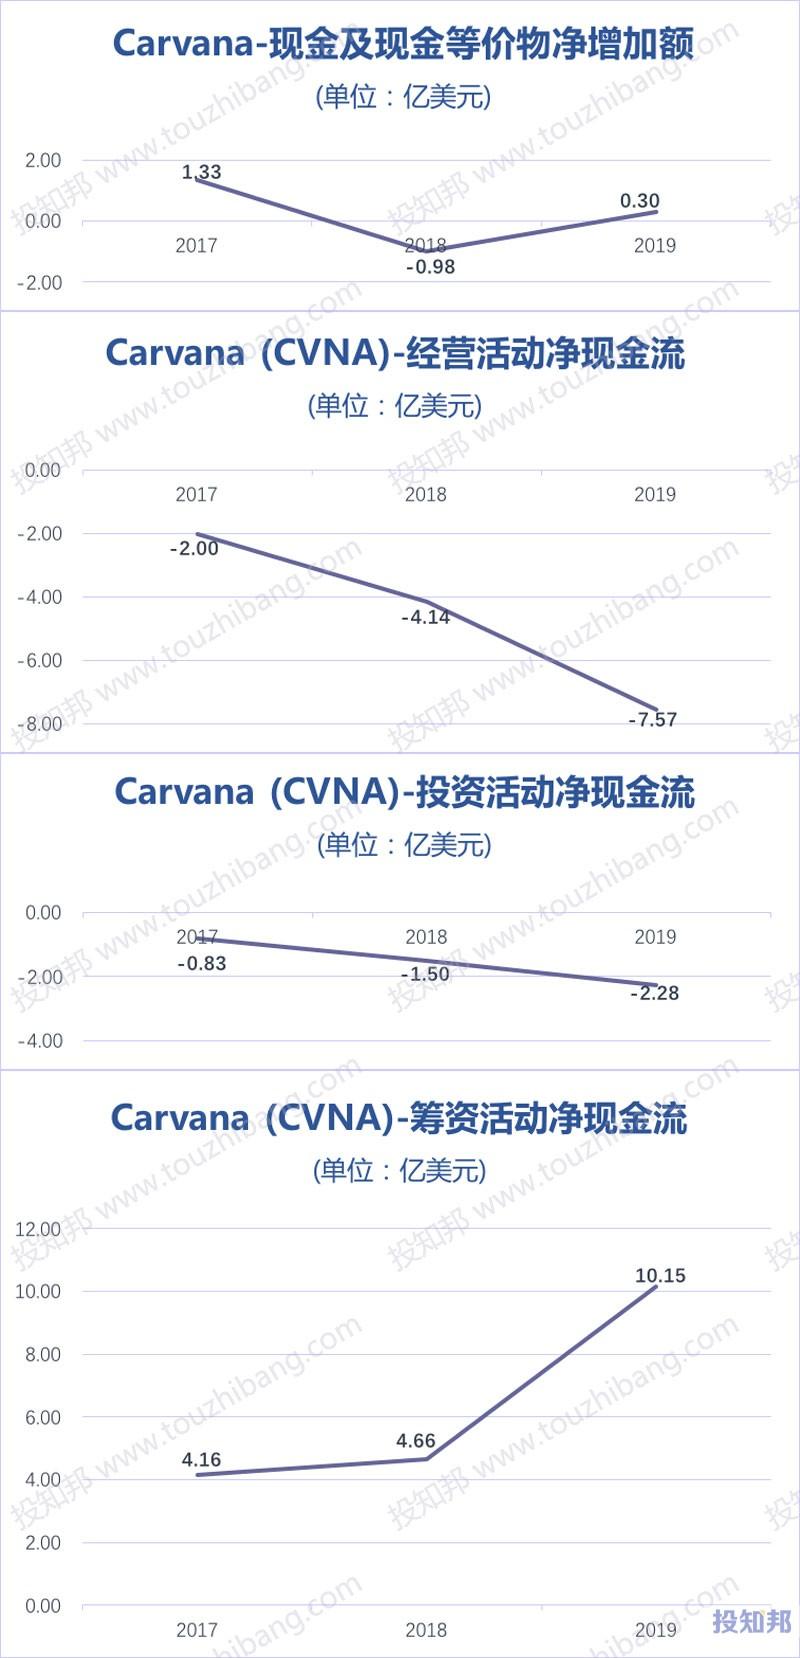 Carvana(CVNA)财报数据图示(2017~2020年Q3,更新)